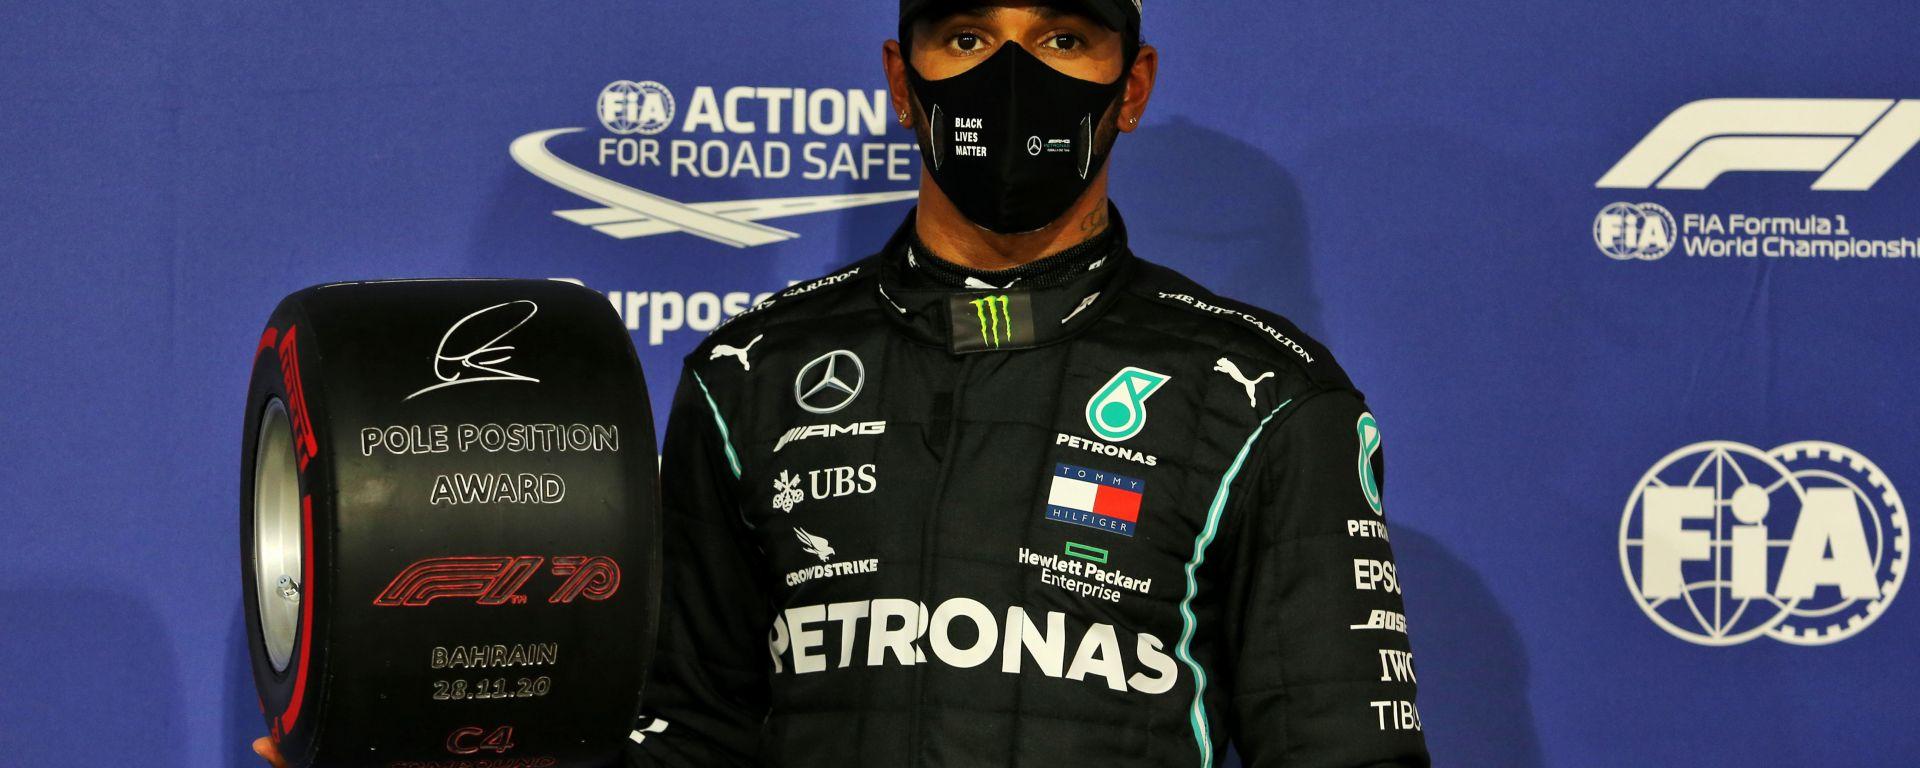 F1 GP Bahrain 2020, Sakhir: Lewis Hamilton (Mercedes AMG F1) con il trofeo della pole position